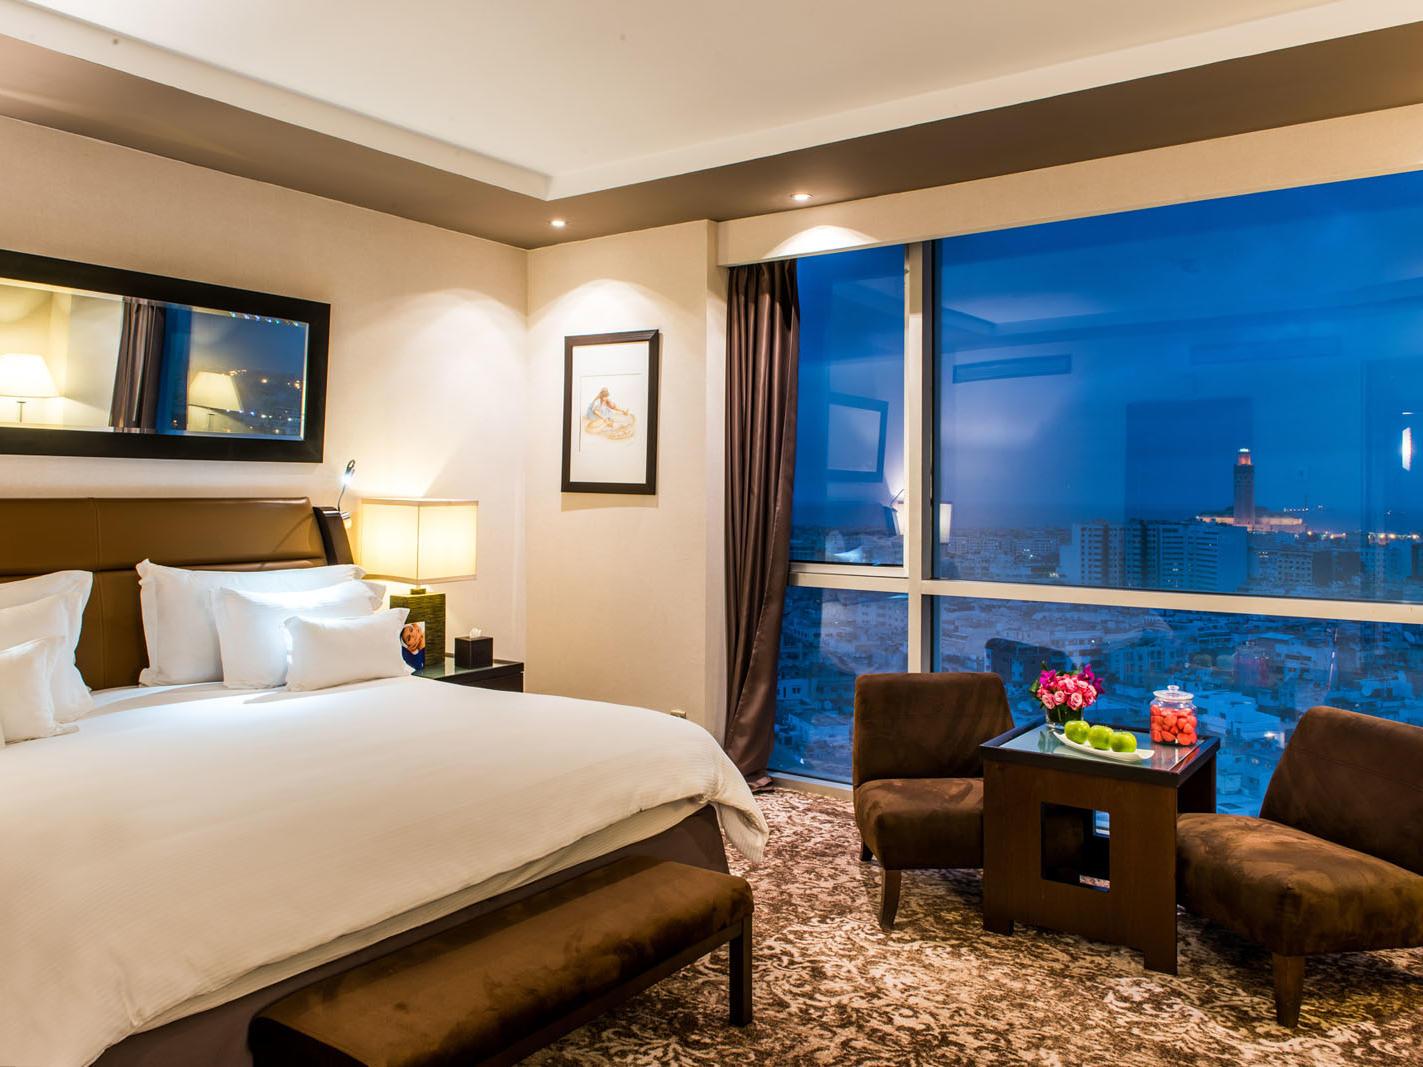 Deluxe Sky Room at Kenzi Tower Hotel in Casablanca, Morocco